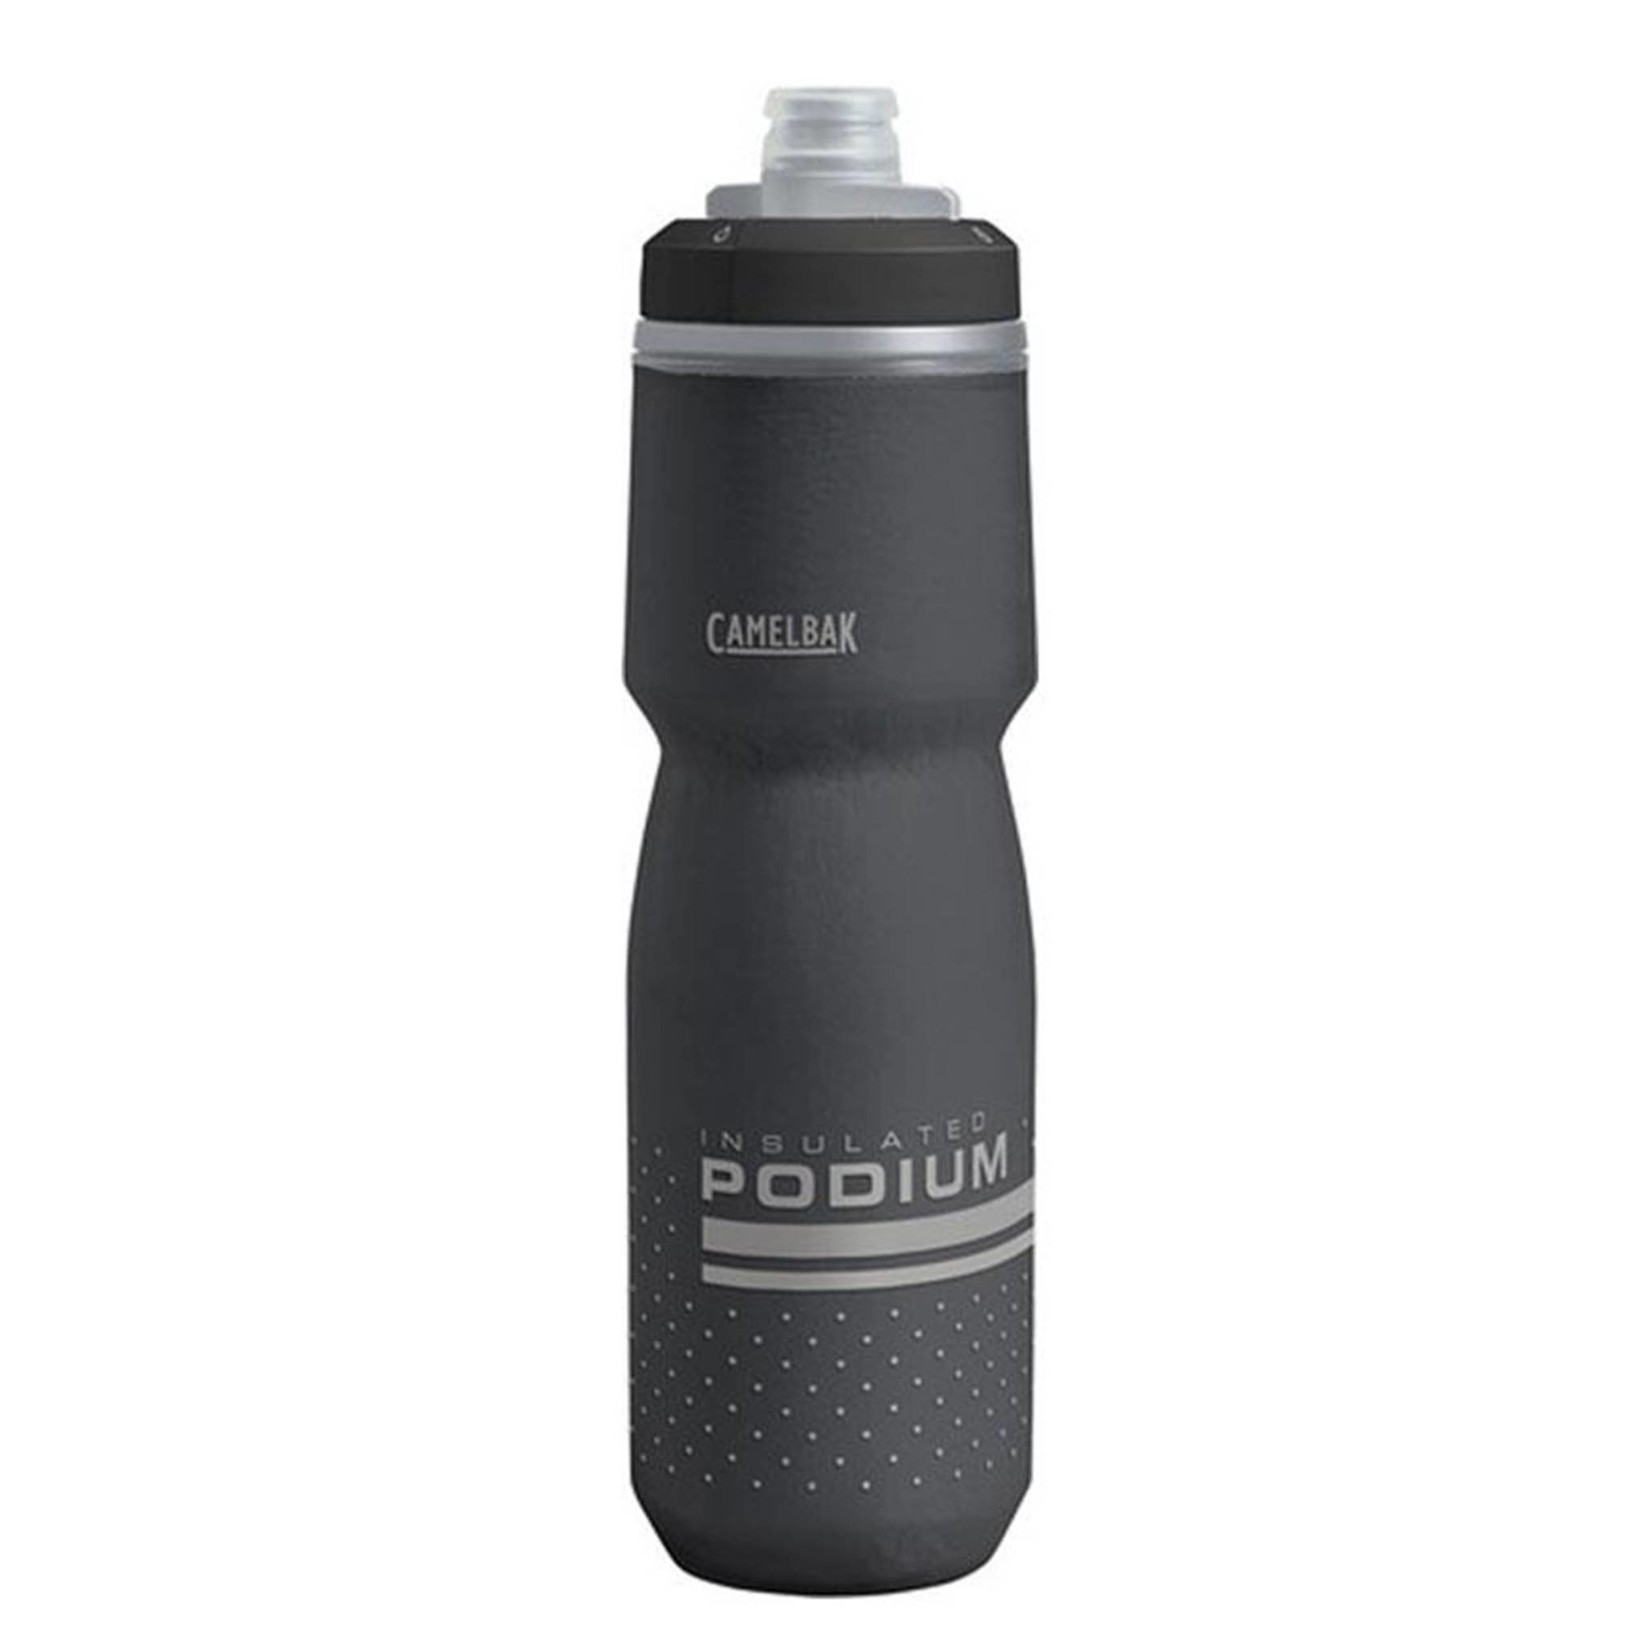 Camelbak Podium Big Chill Water Bottle Black 710ml